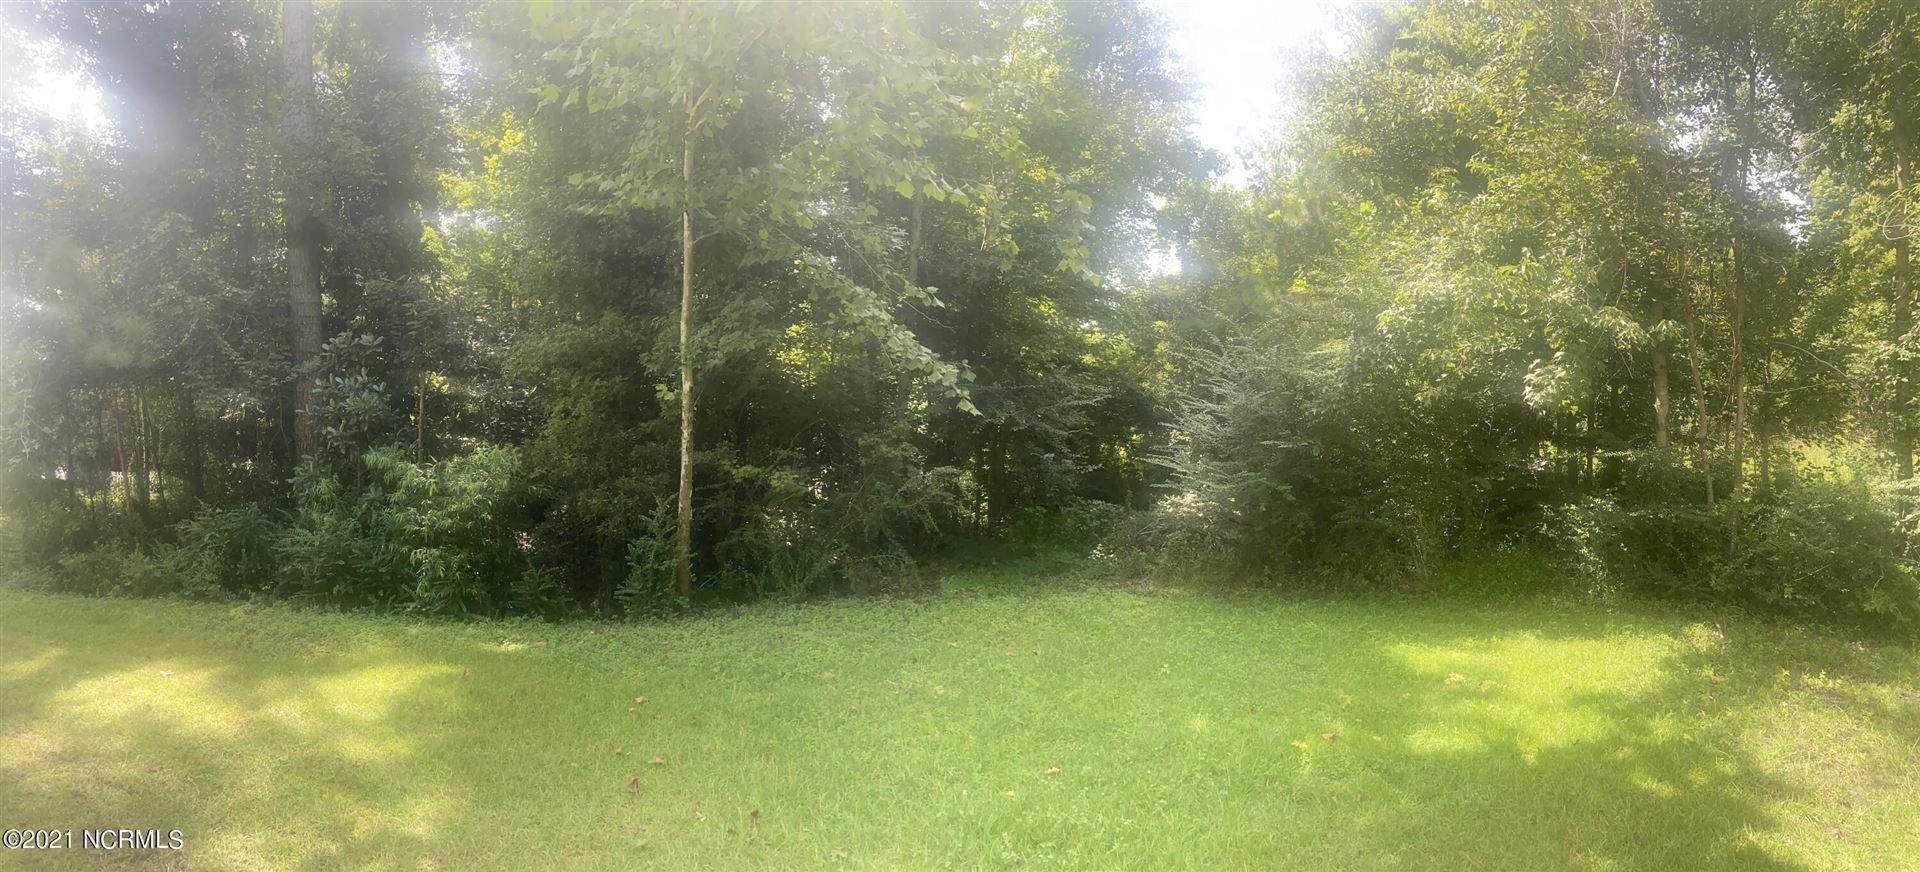 Photo of 000 Old Bay River Road, Grantsboro, NC 28529 (MLS # 100287540)